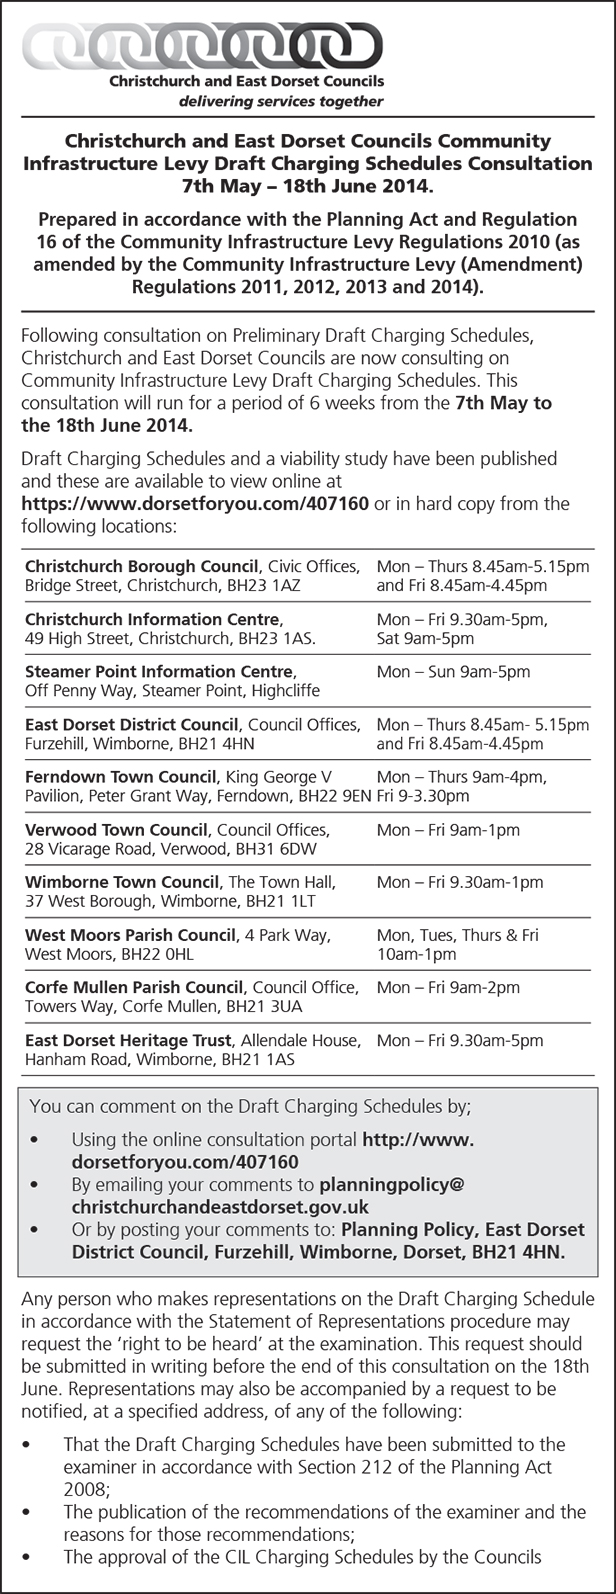 Christchurch and East Dorset Councils public notice